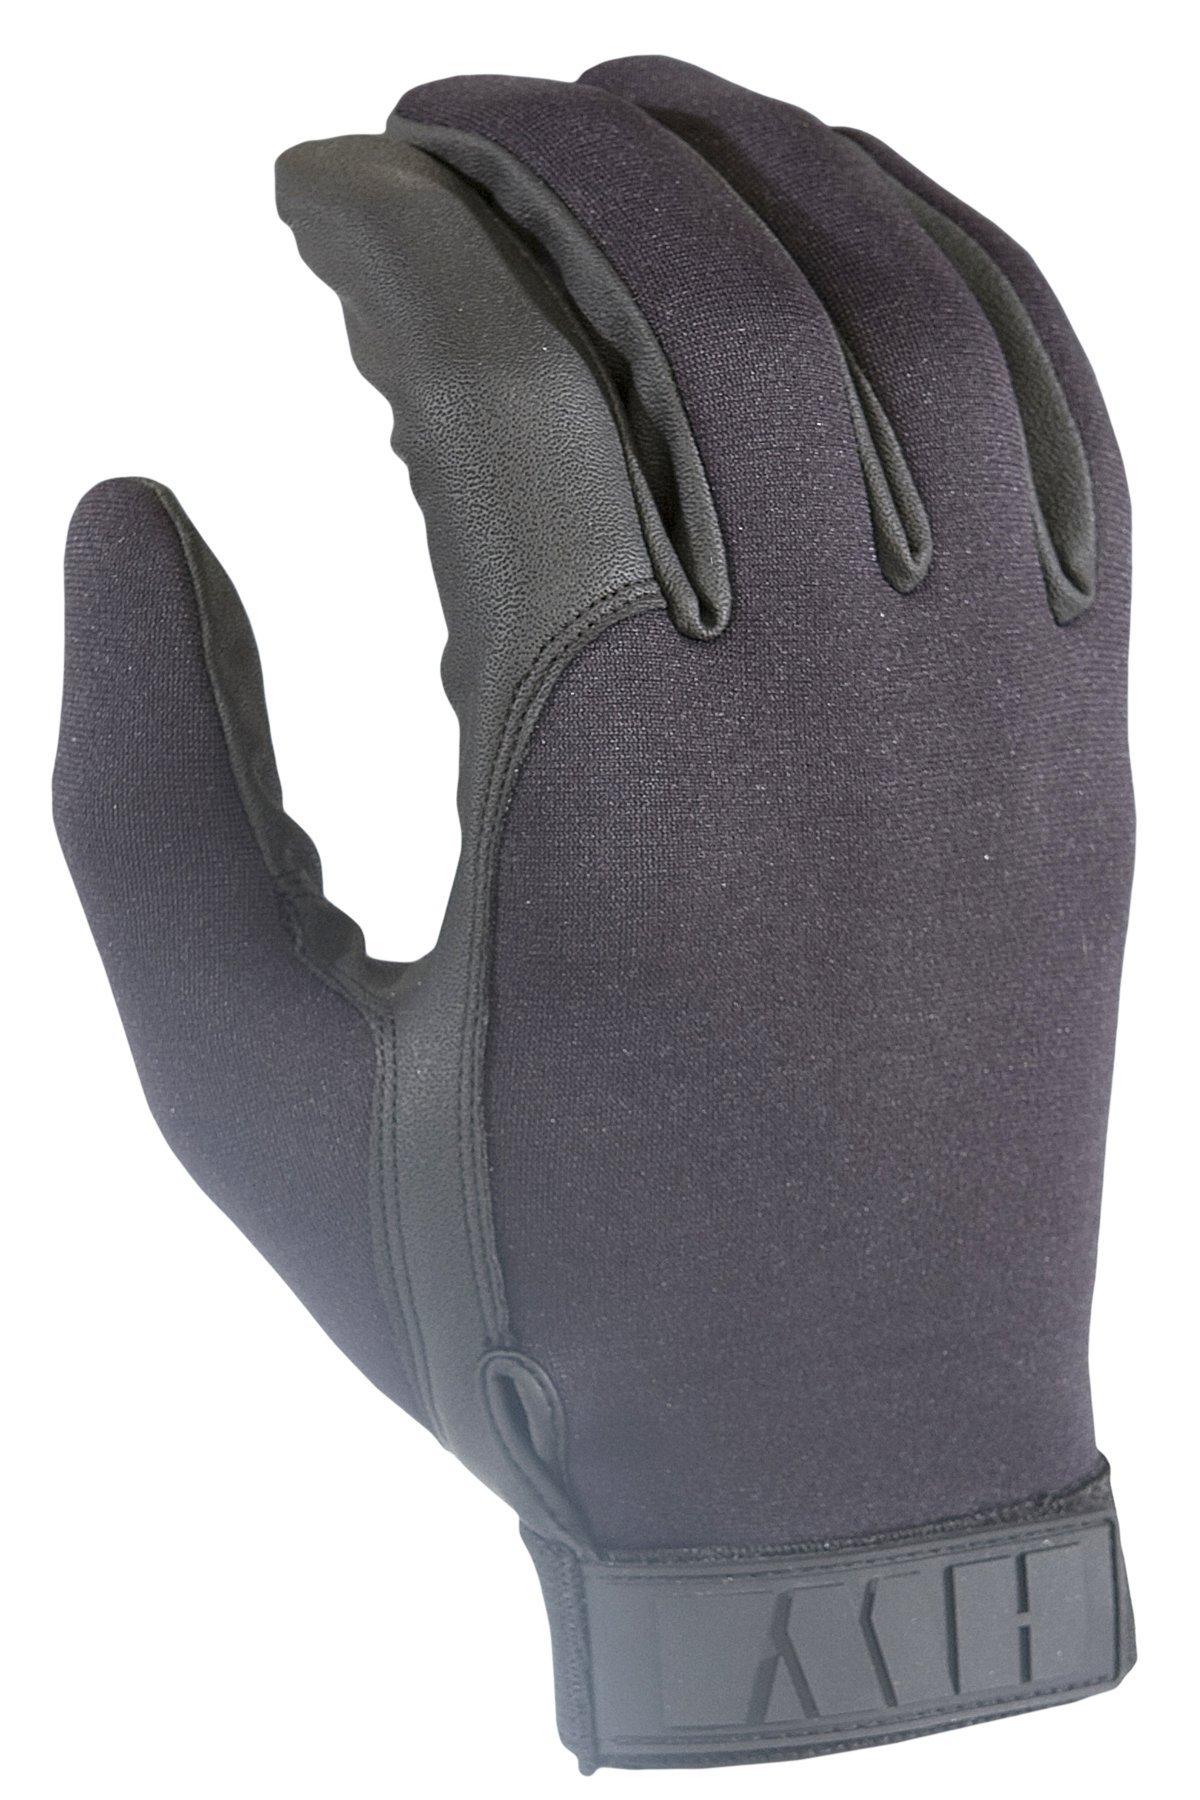 ACK, LLC HWI Gear Neoprene Duty Glove, Small, Black by HWI